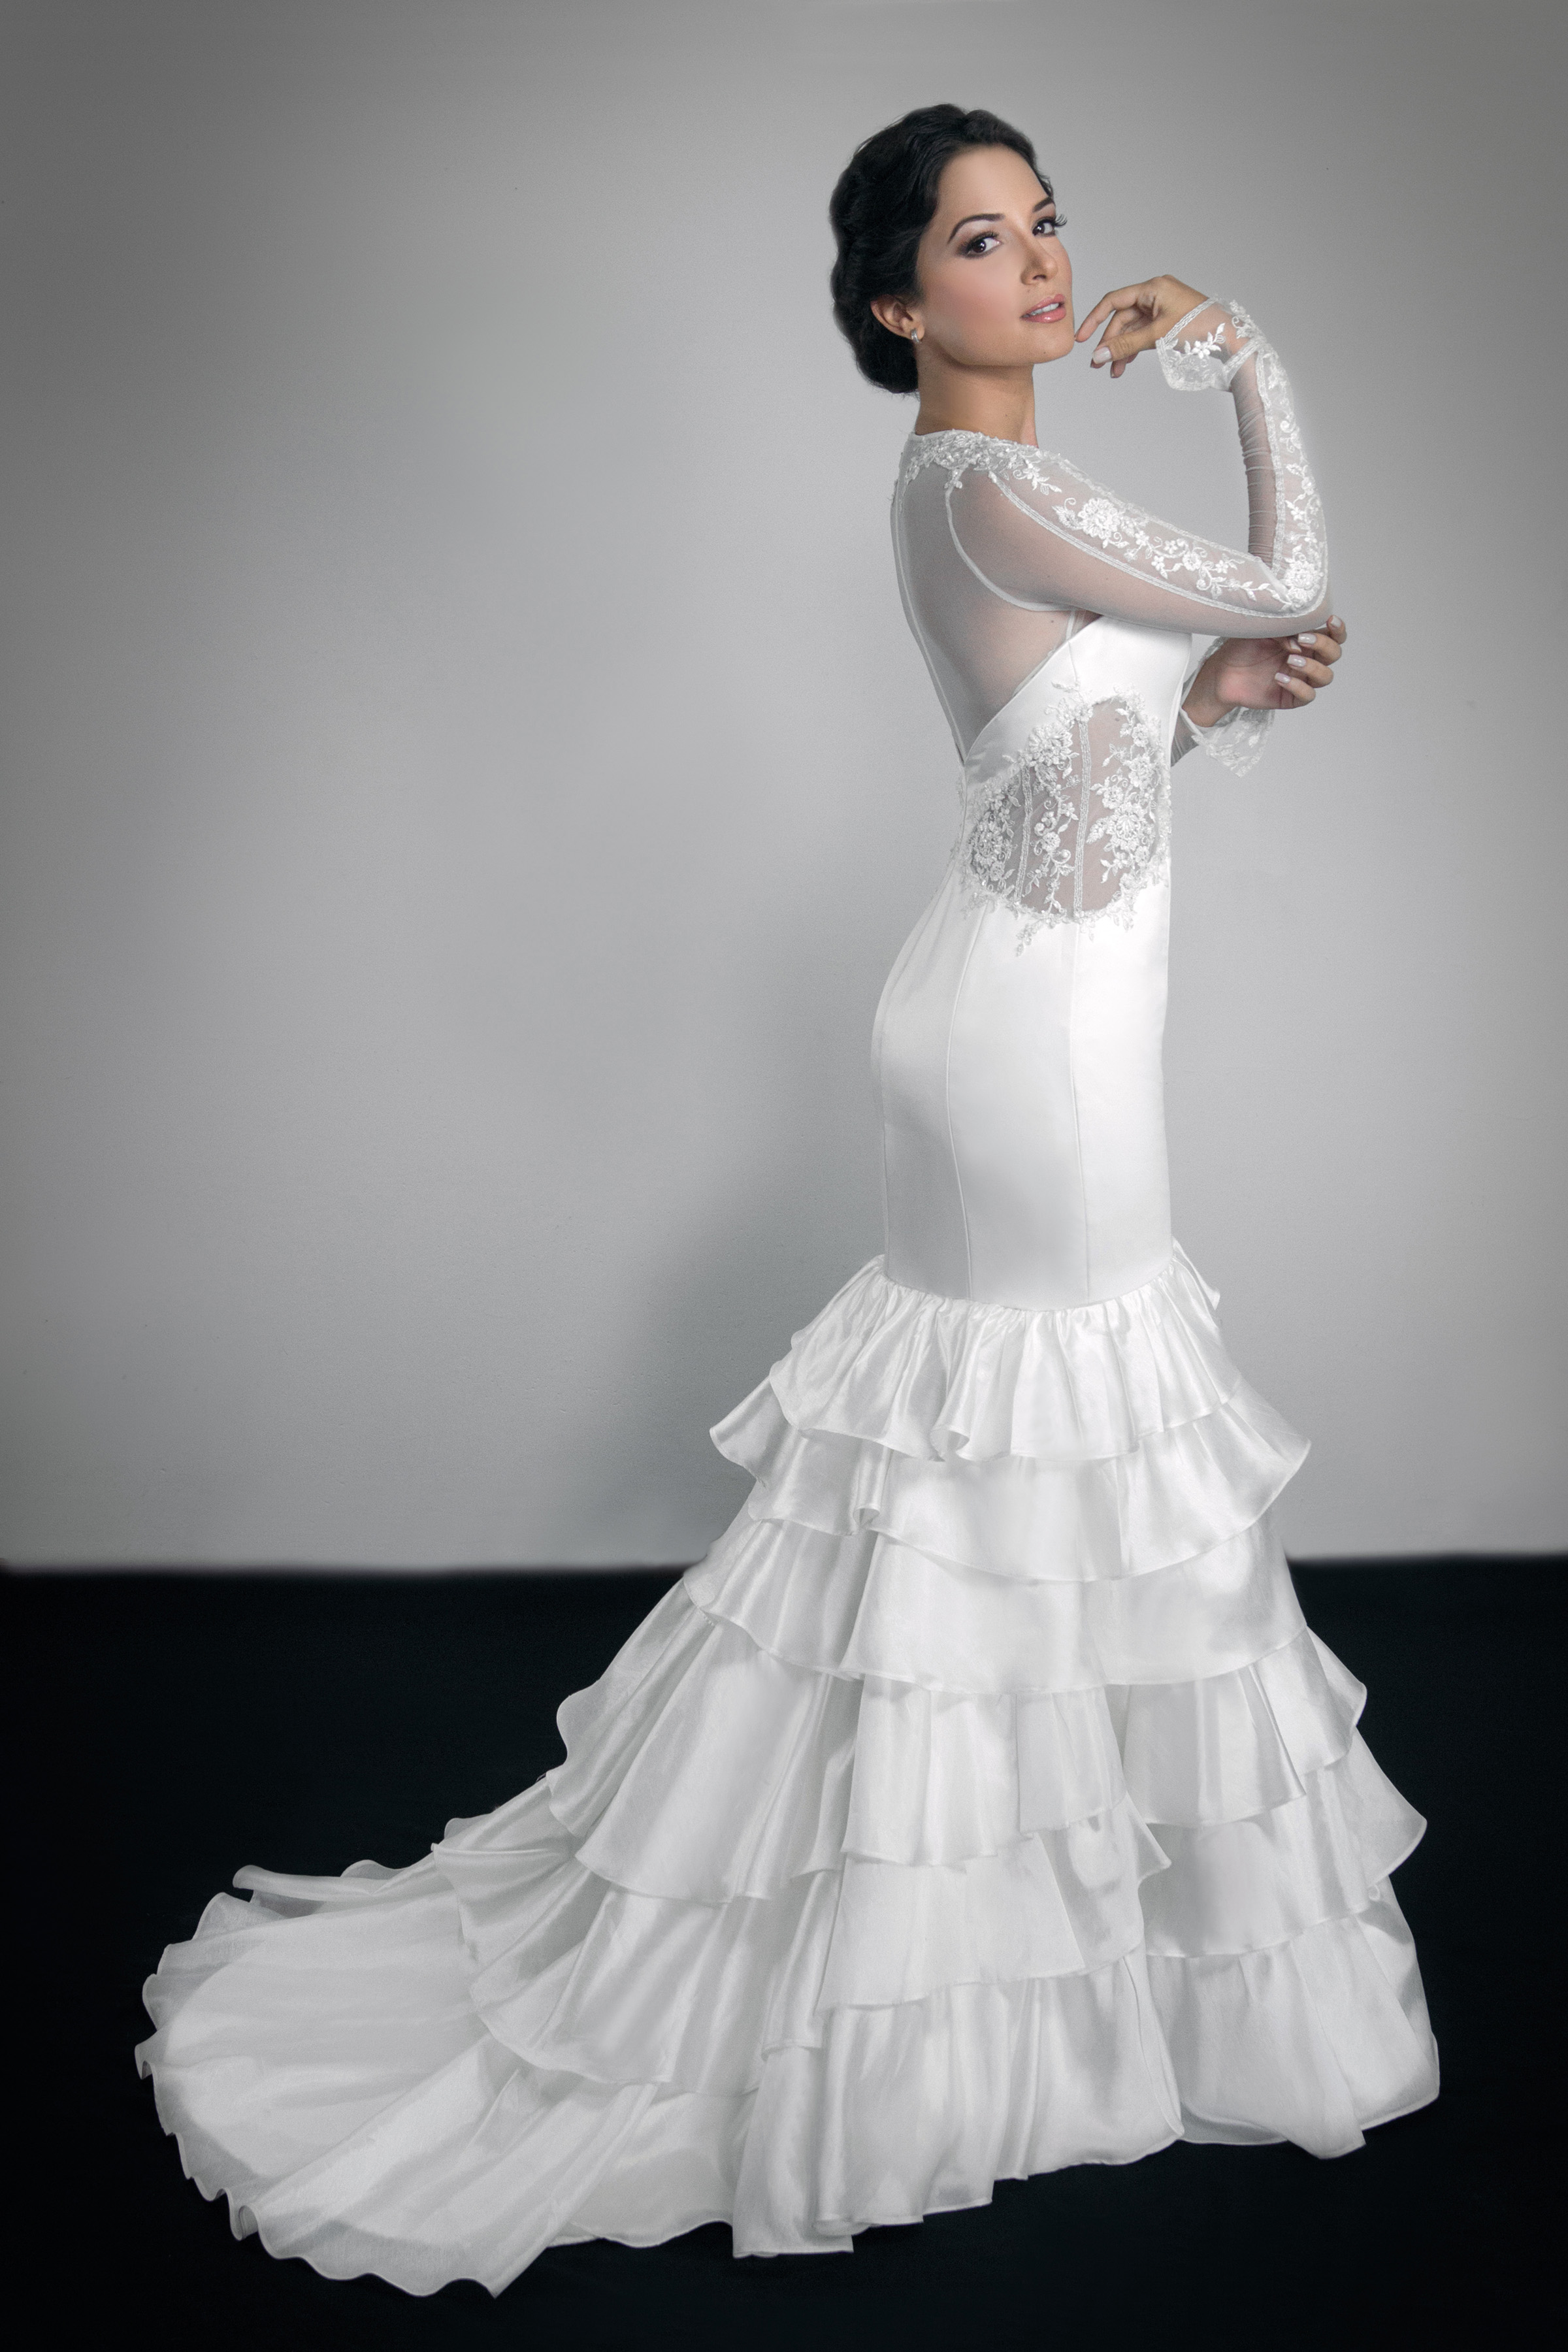 Vestidos de novia en alquiler barquisimeto